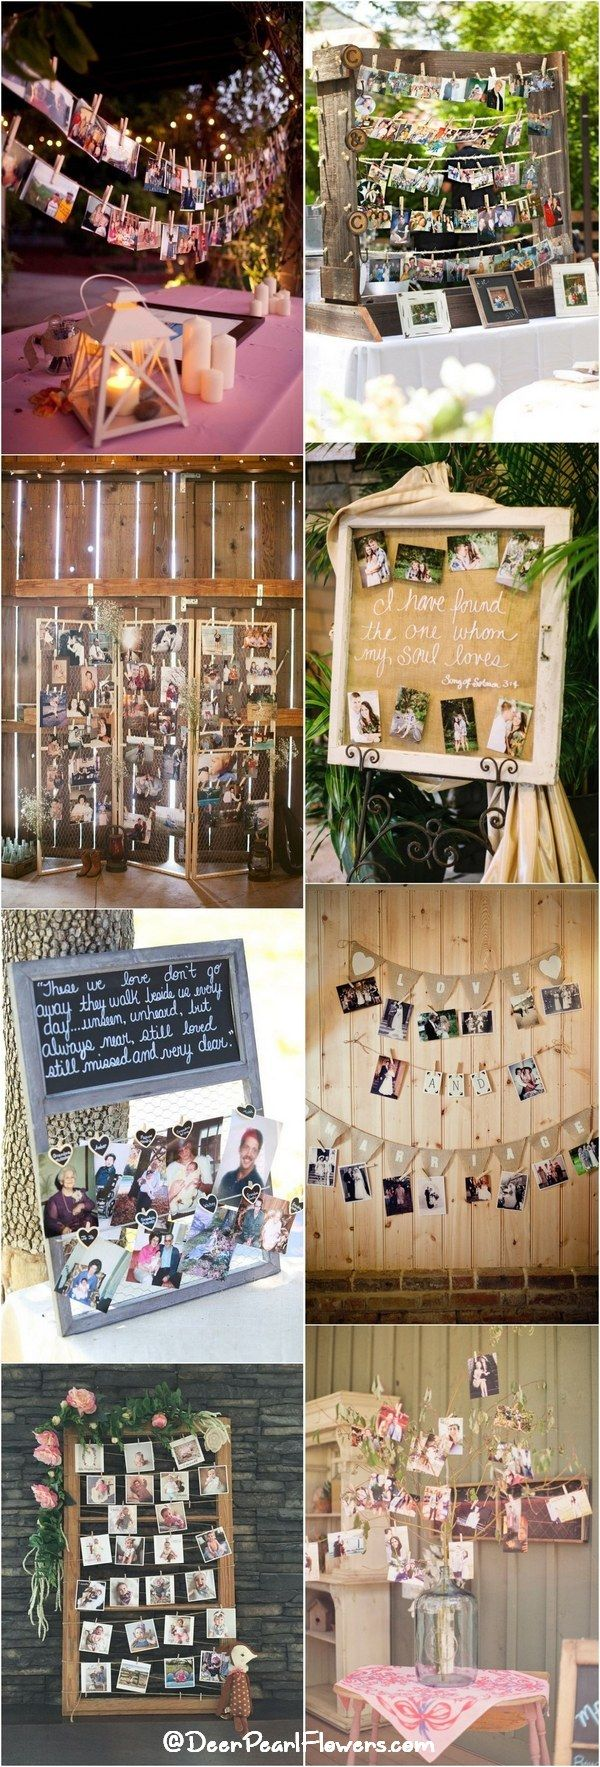 Rustic country wedding photo display ideas / http://www.deerpearlflowers.com/wedding-photo-display-ideas/